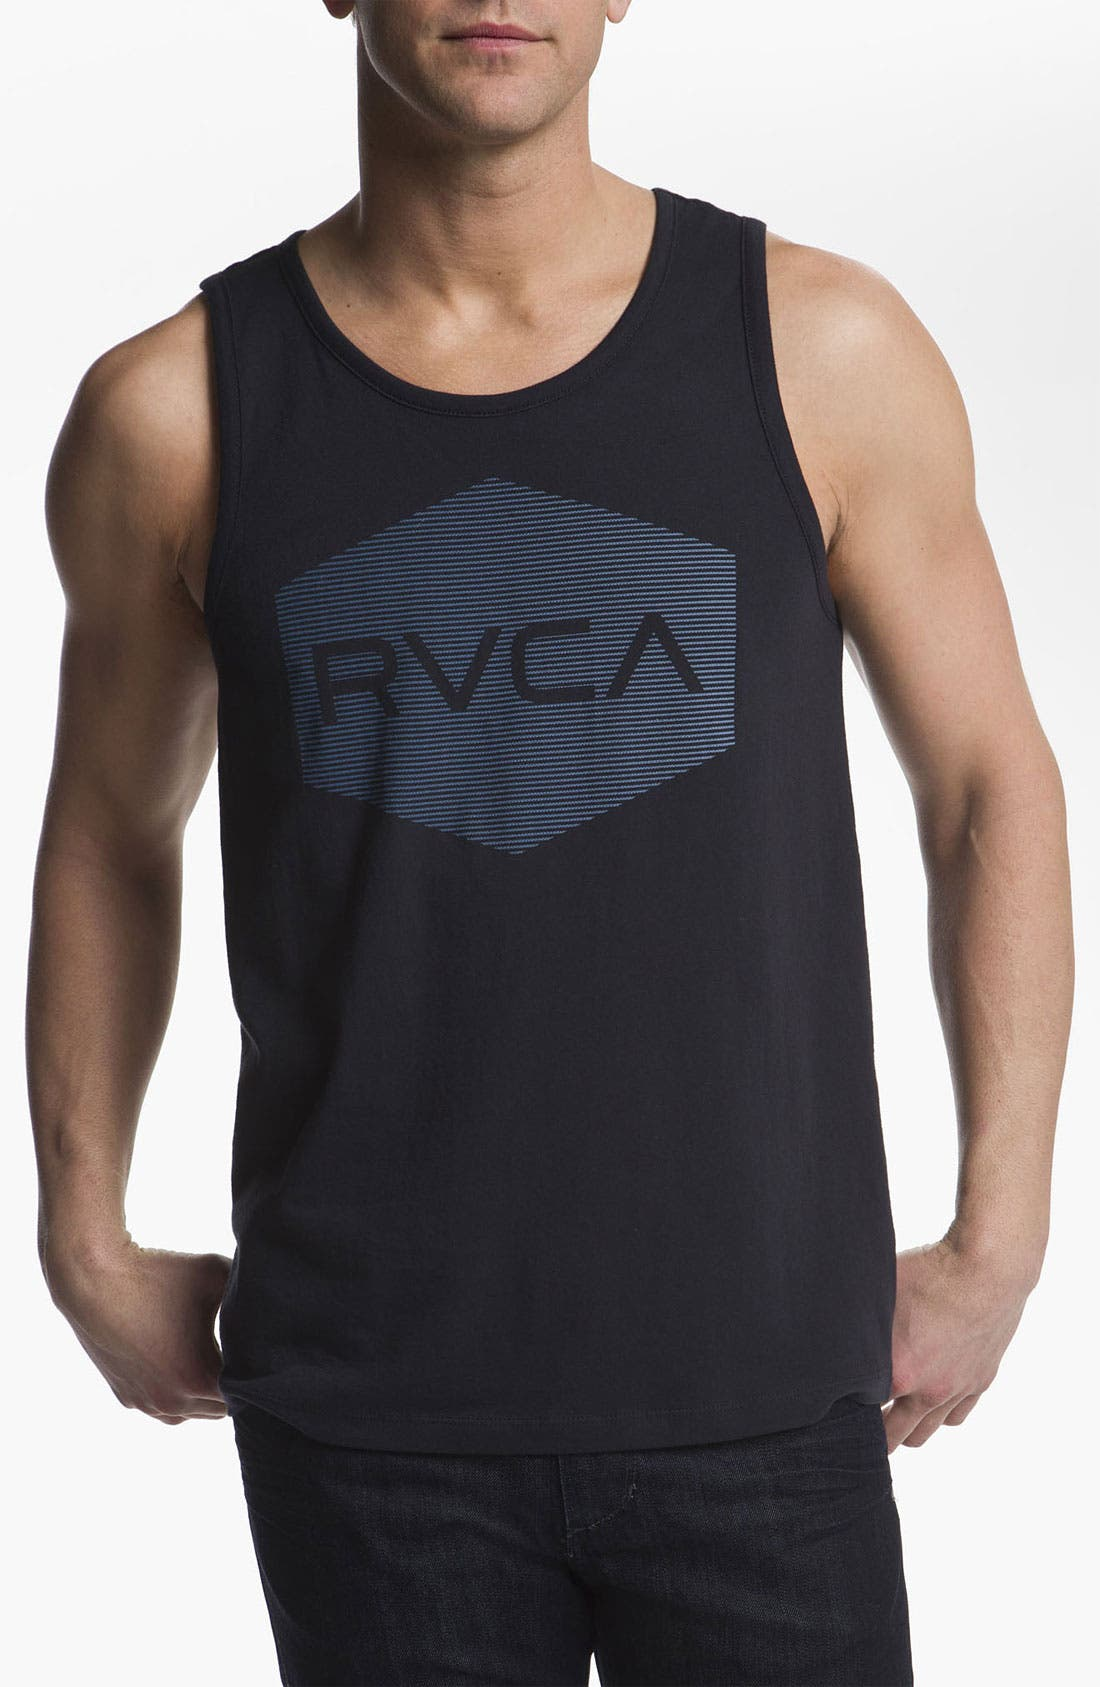 Main Image - RVCA 'Halftone Hex' Tank Top